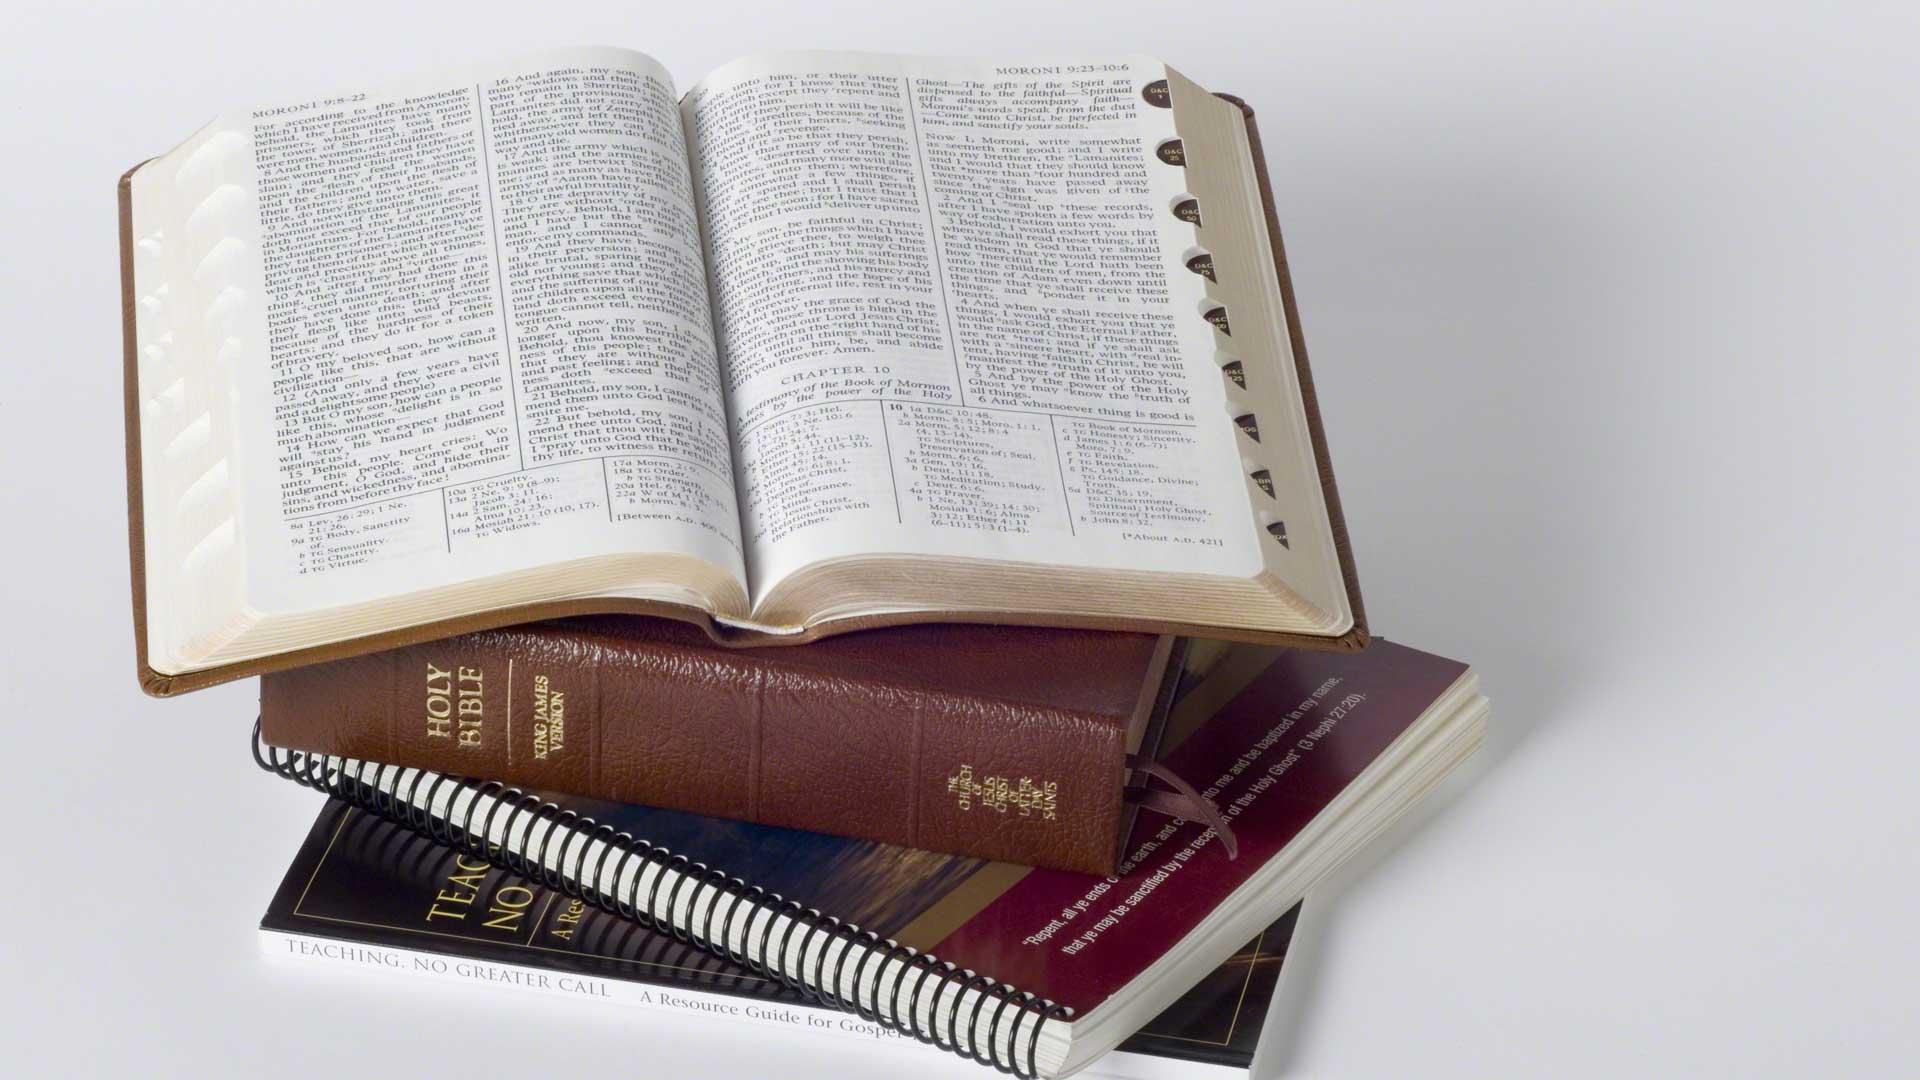 Copes of the scriptures. Photo via Gospel Media Library.